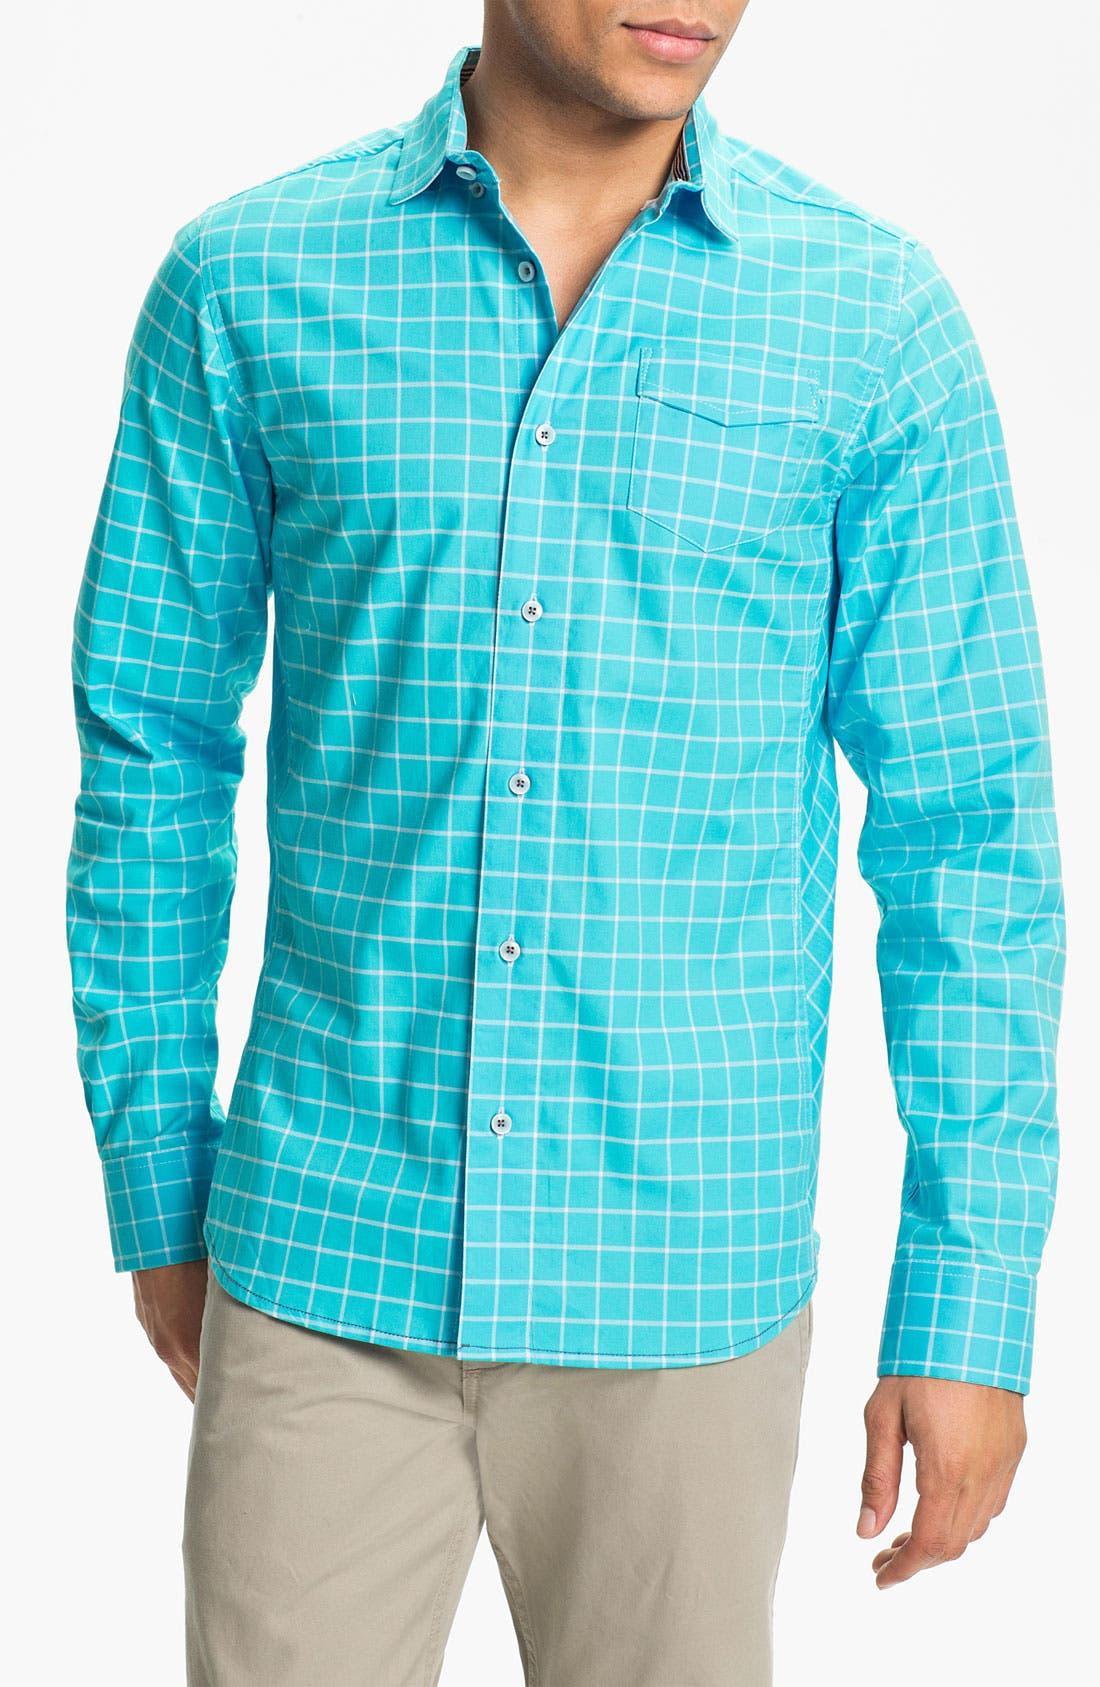 Main Image - Descendant of Thieves Windowpane Woven Shirt